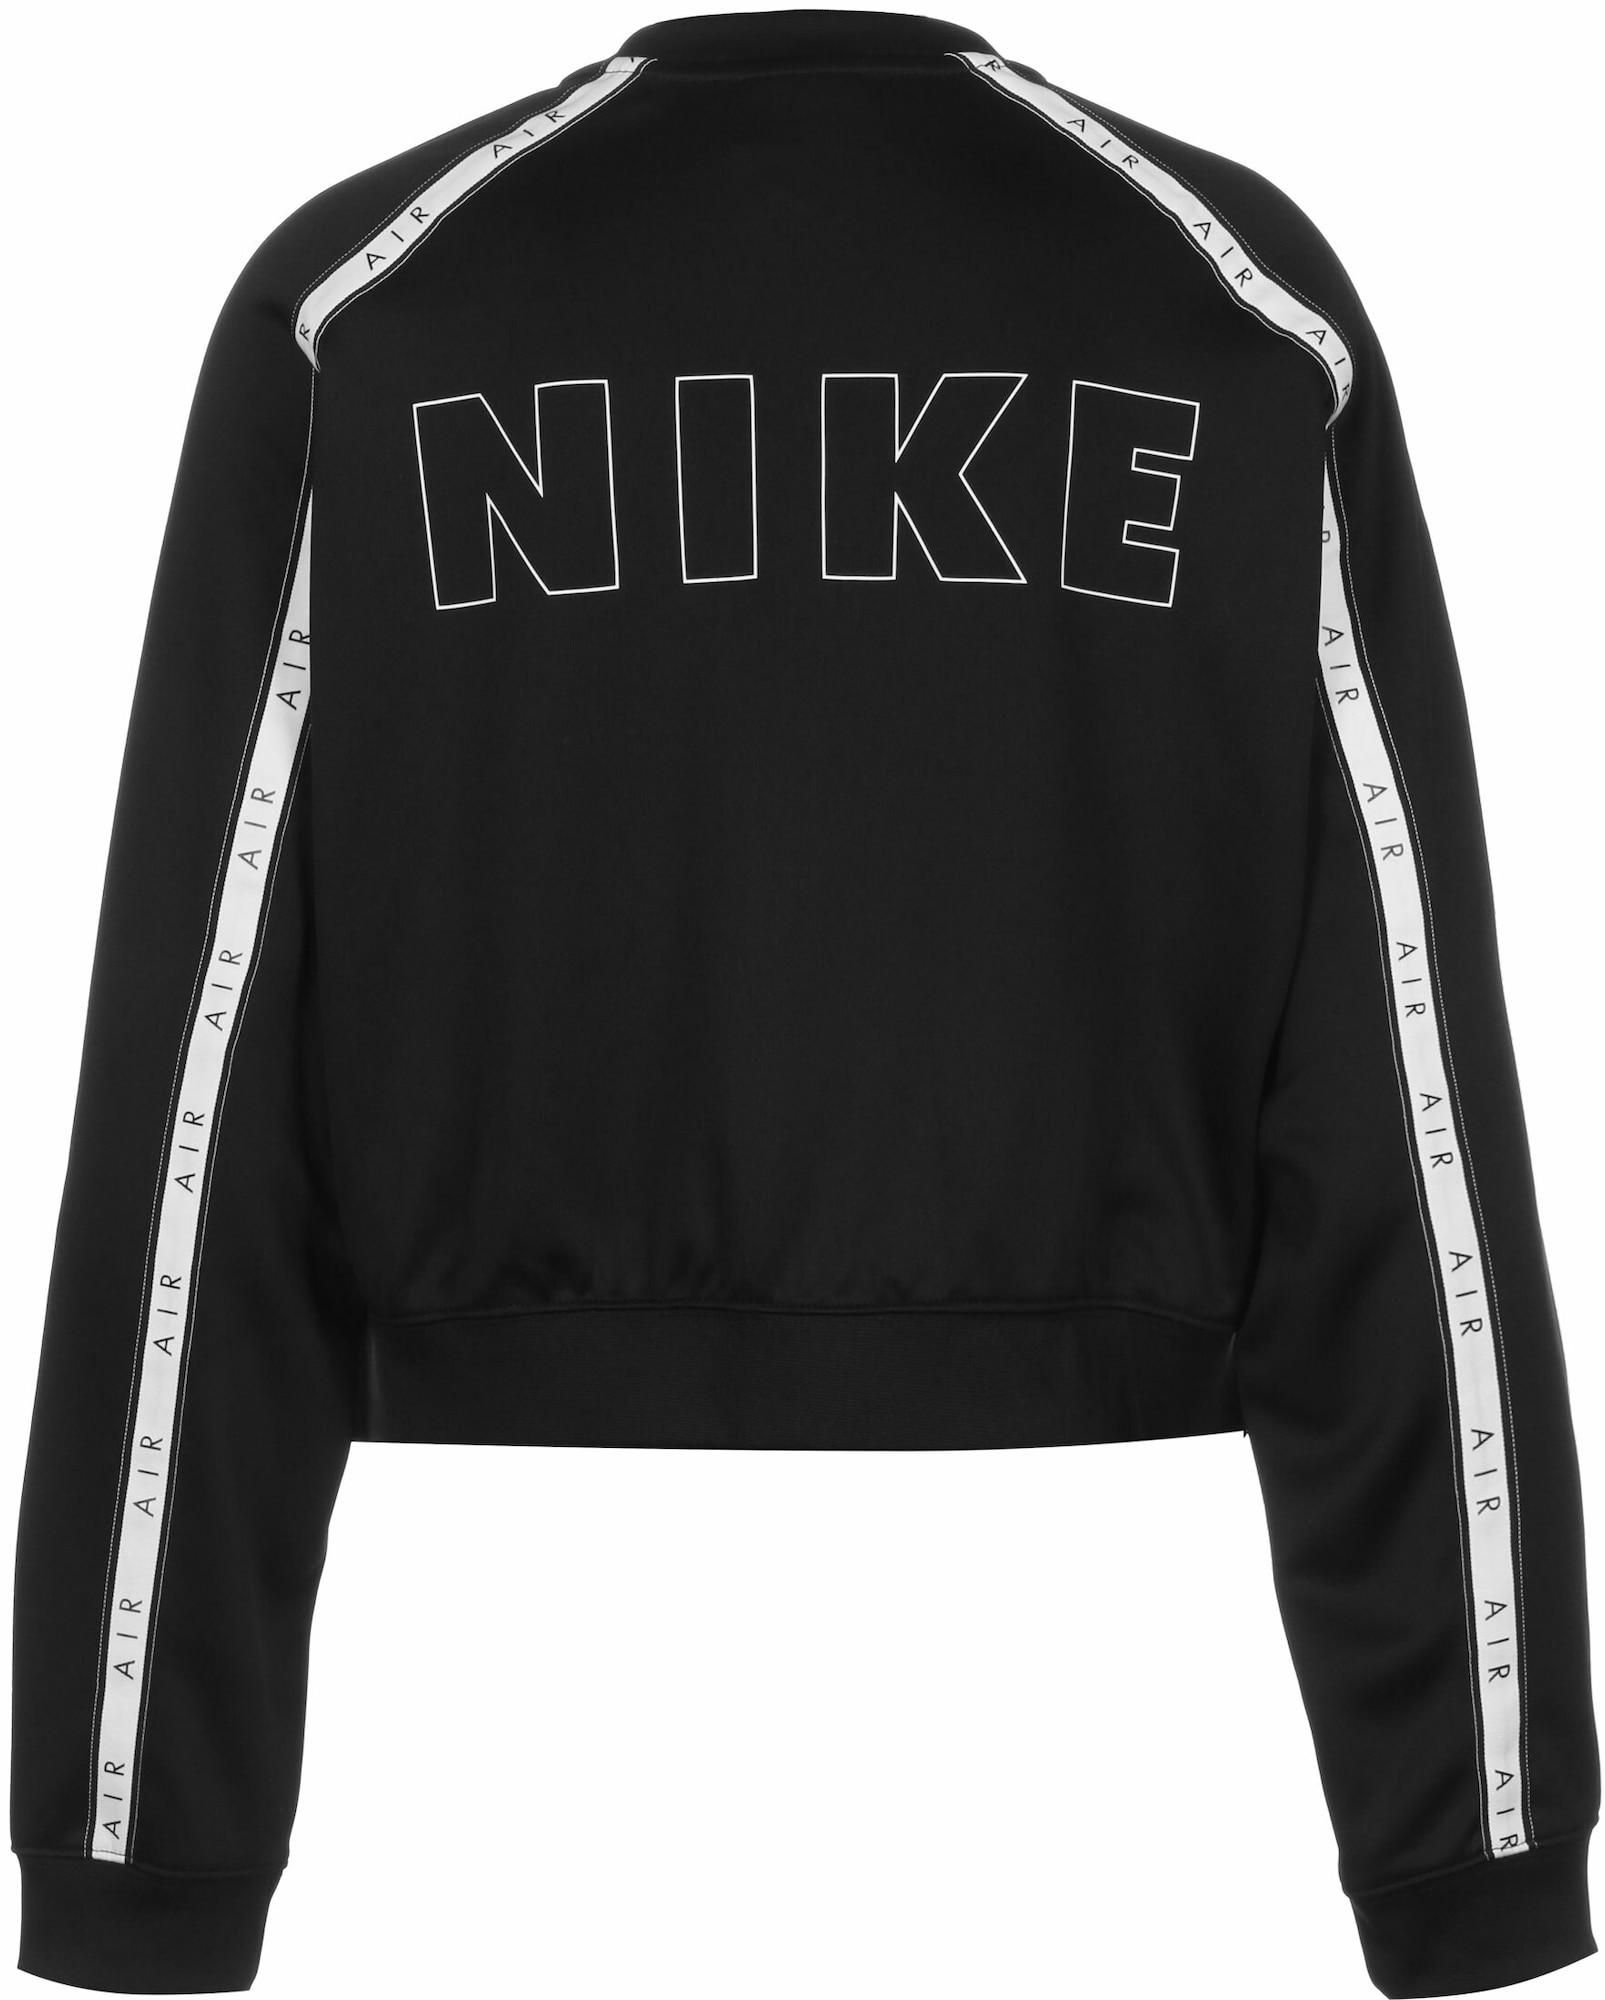 nike sportswear - Trainingsjacke ' Air '